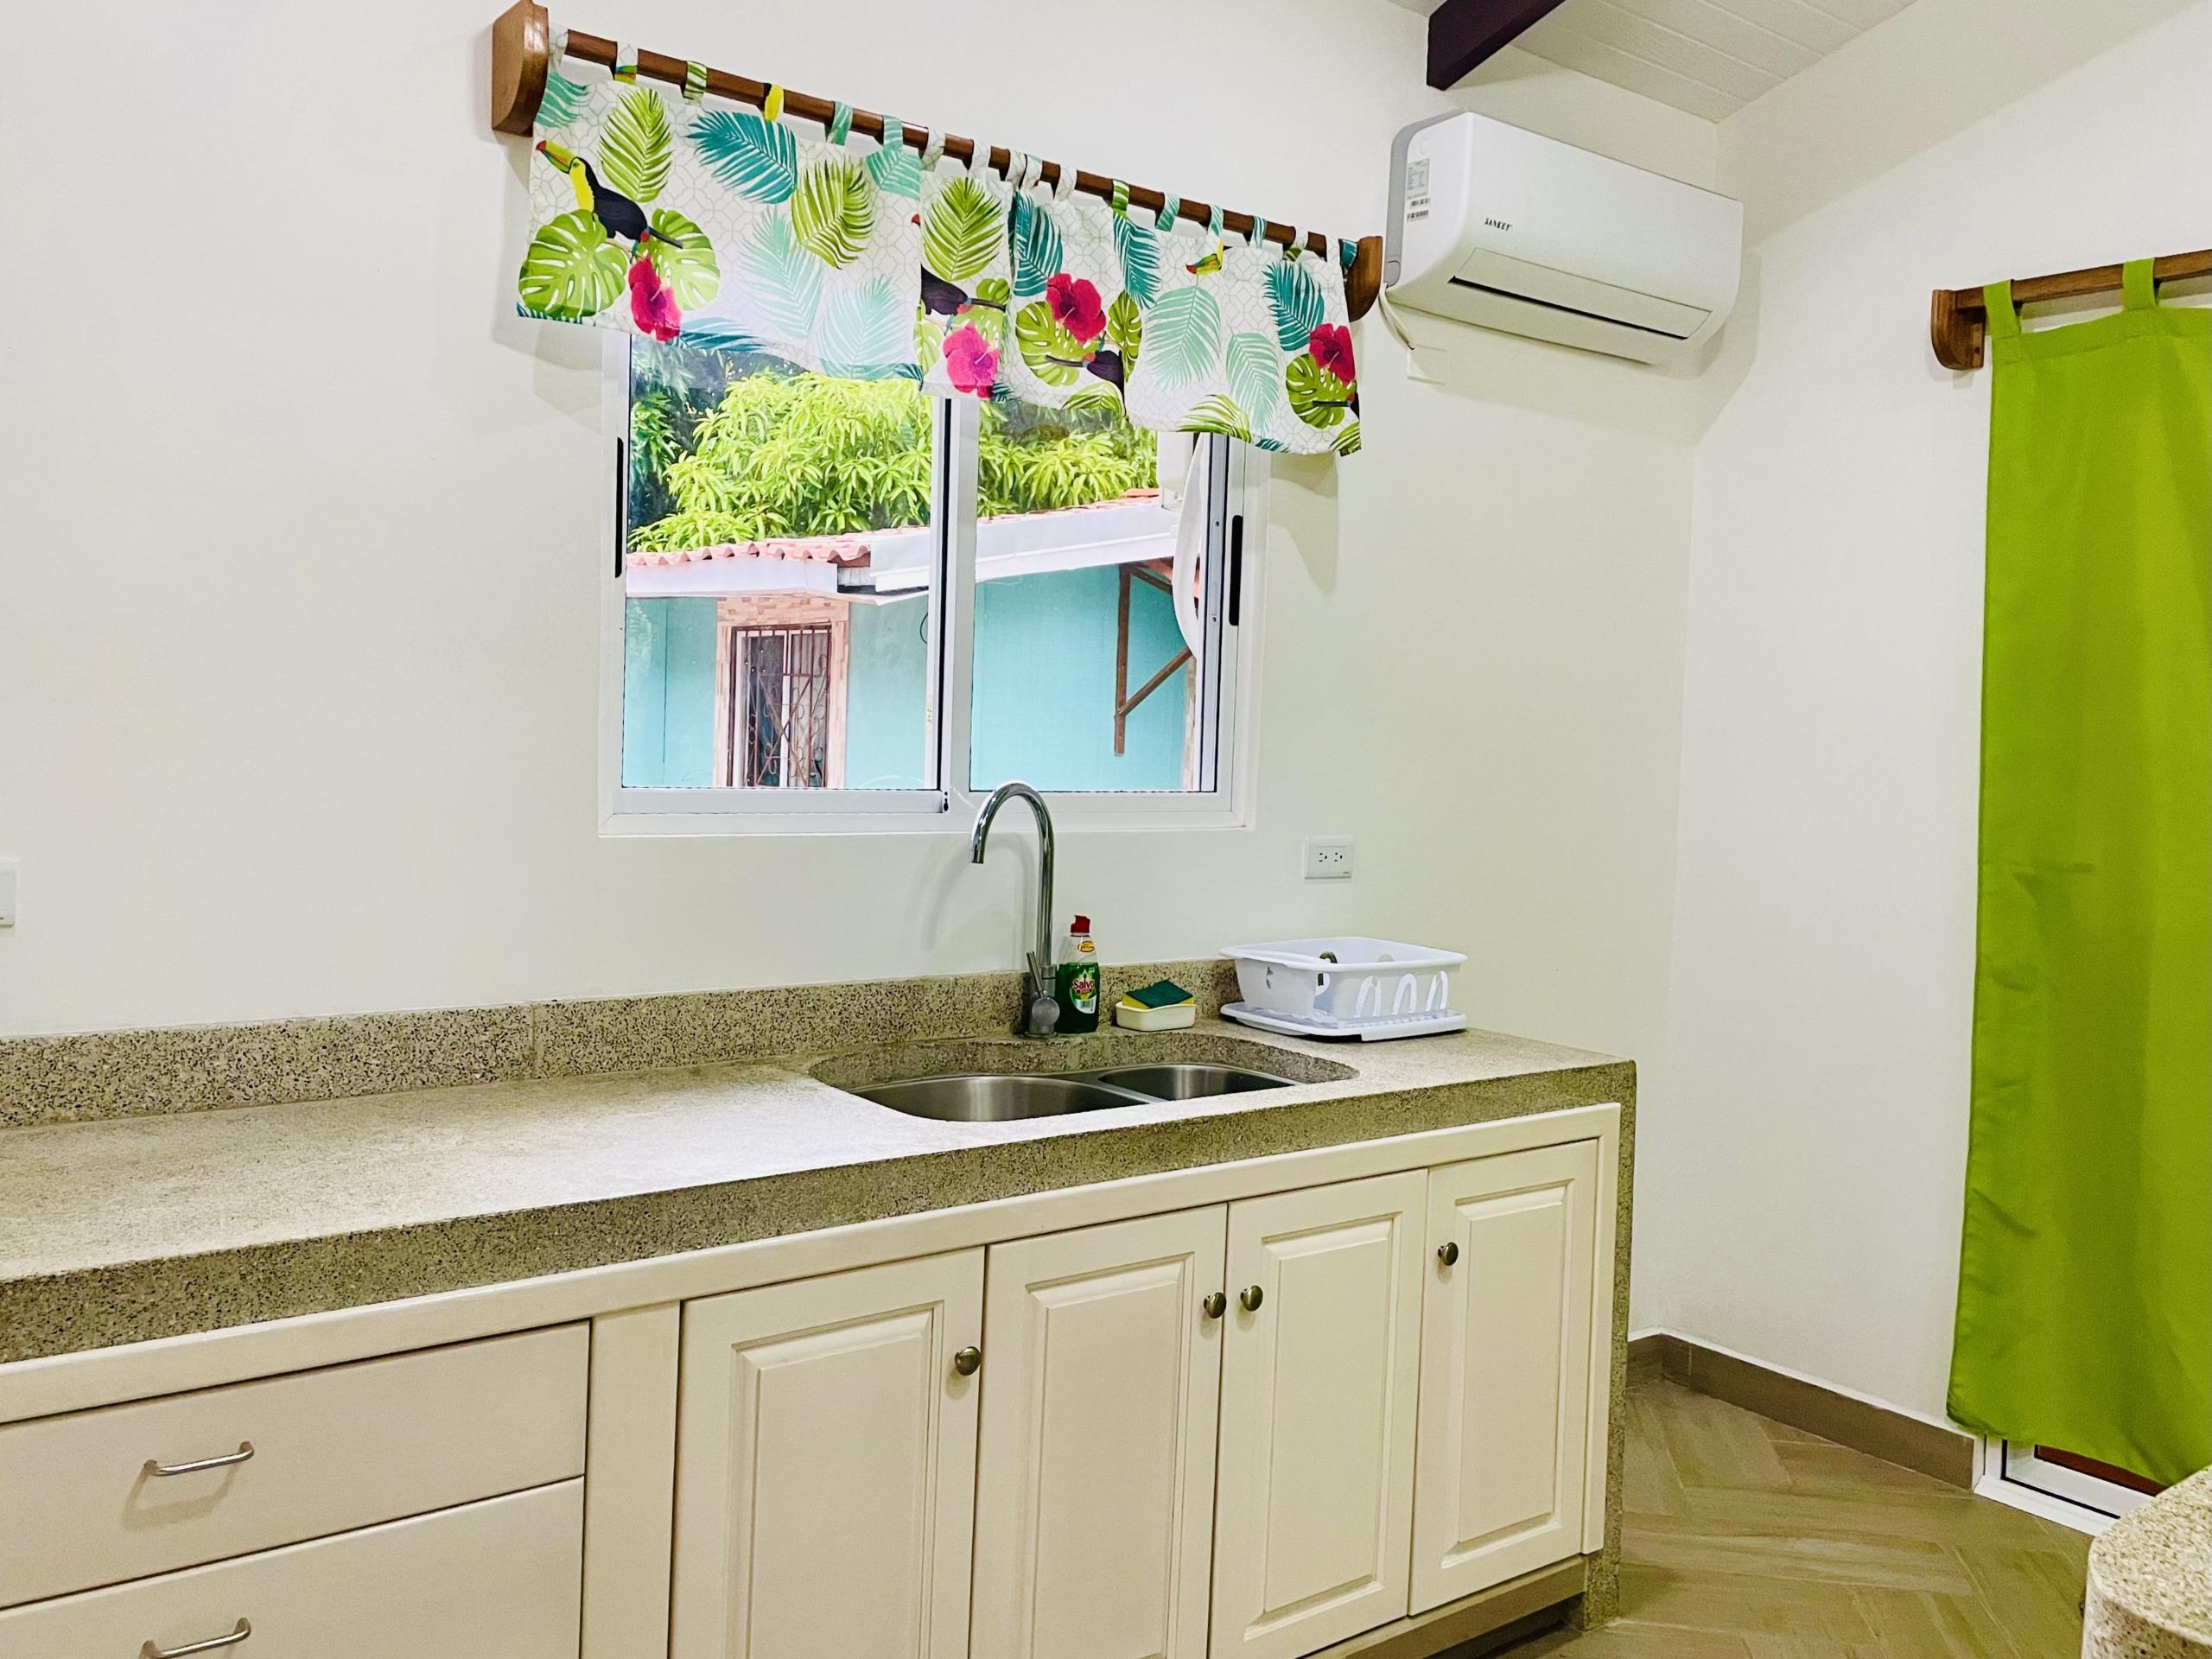 pelicano-dorado-kitchen-sink